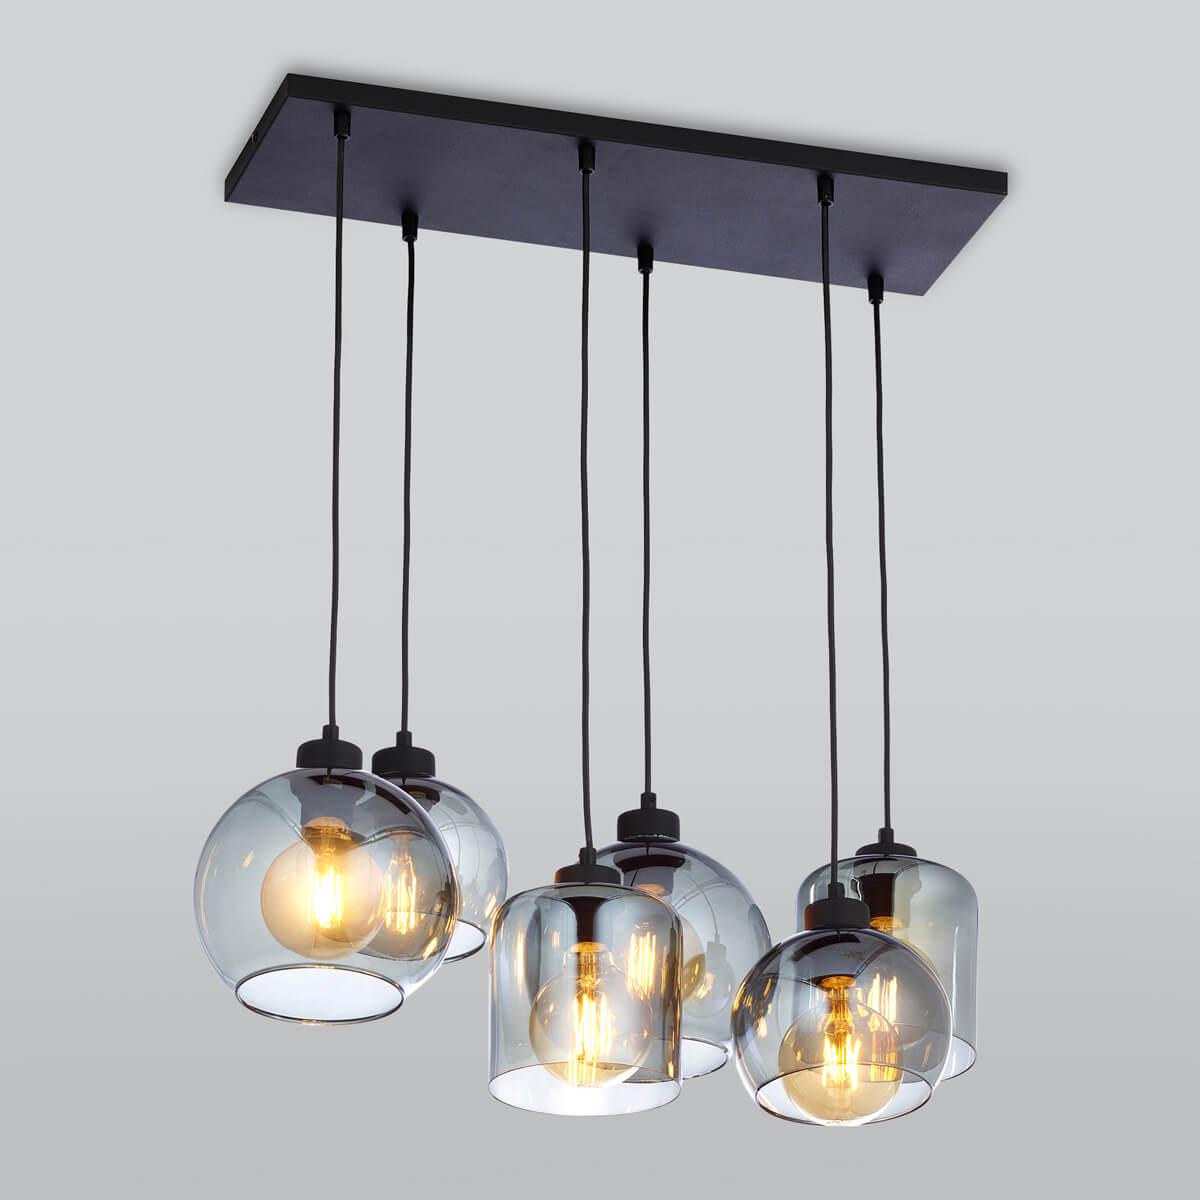 Светильник TK Lighting 2554 Sintra